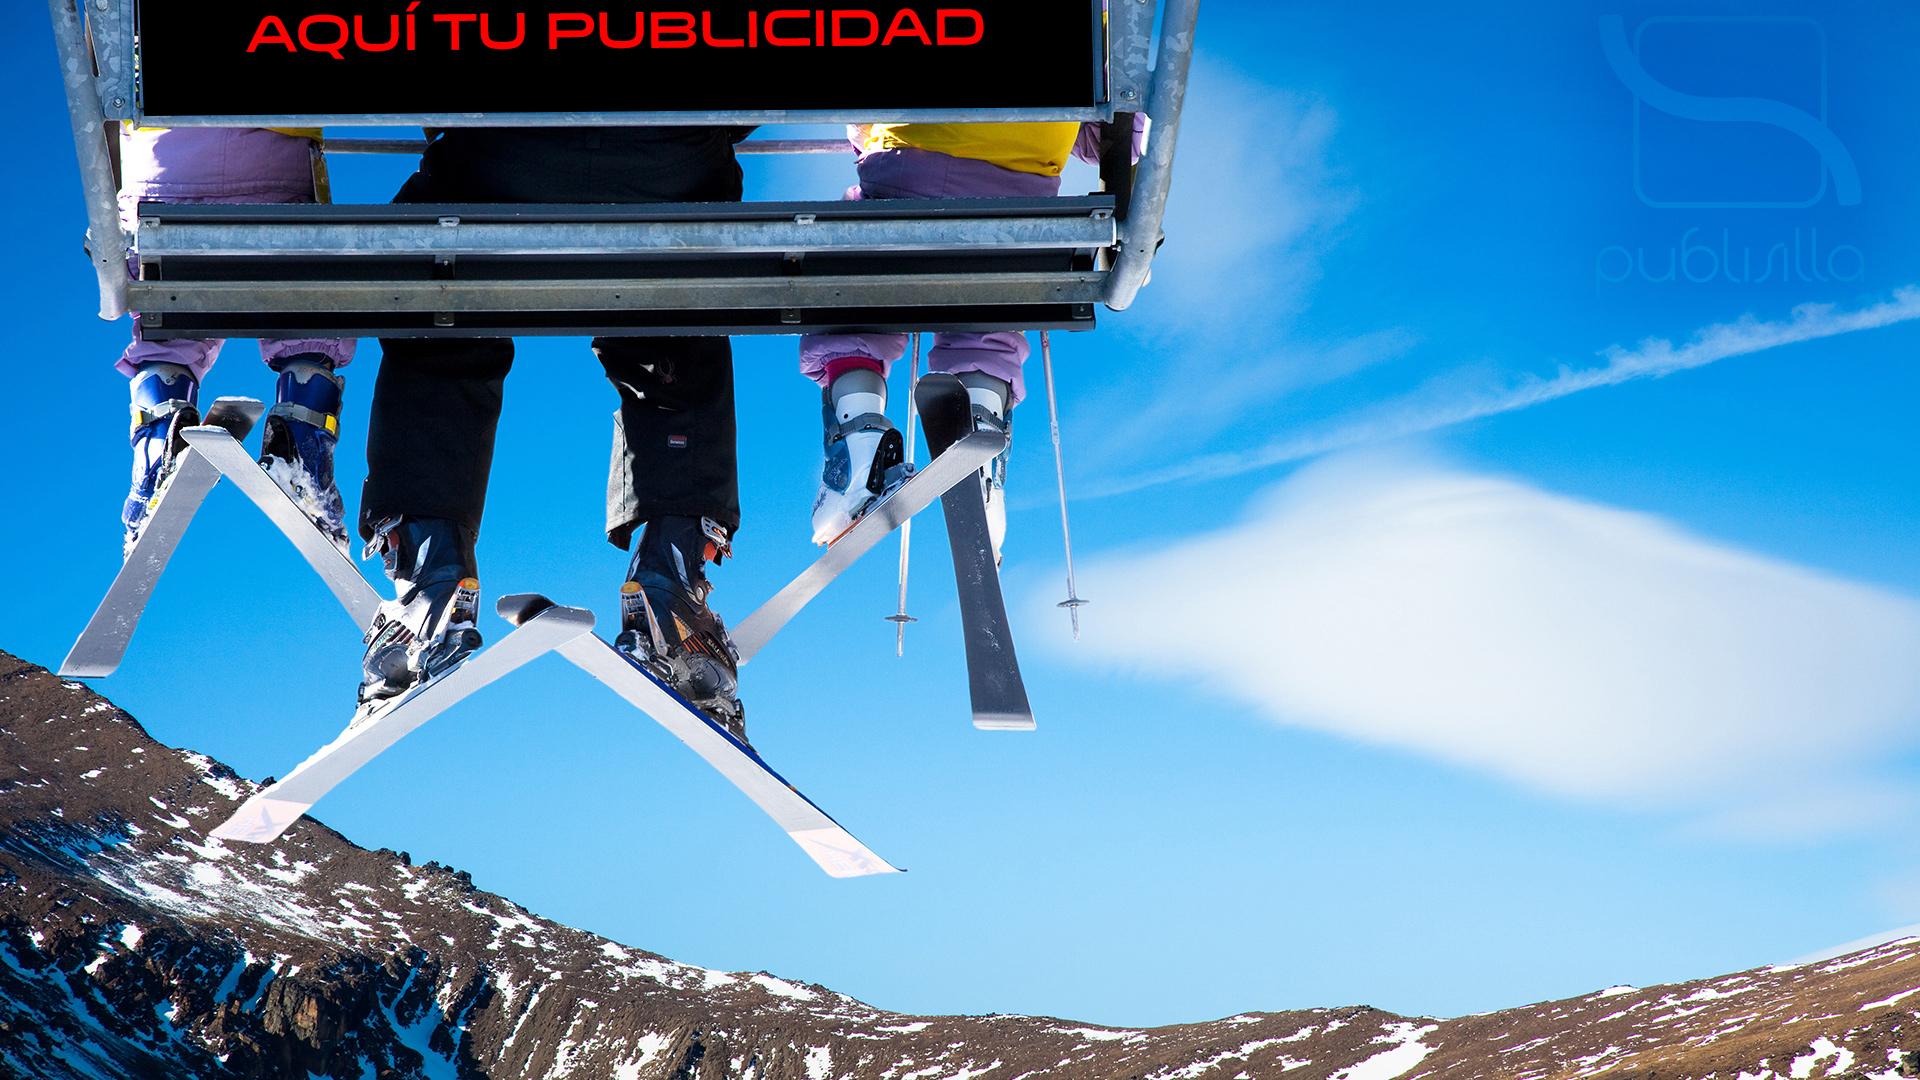 ski-chair-lift-wallpaper-53325-55052-hd-wallpapers